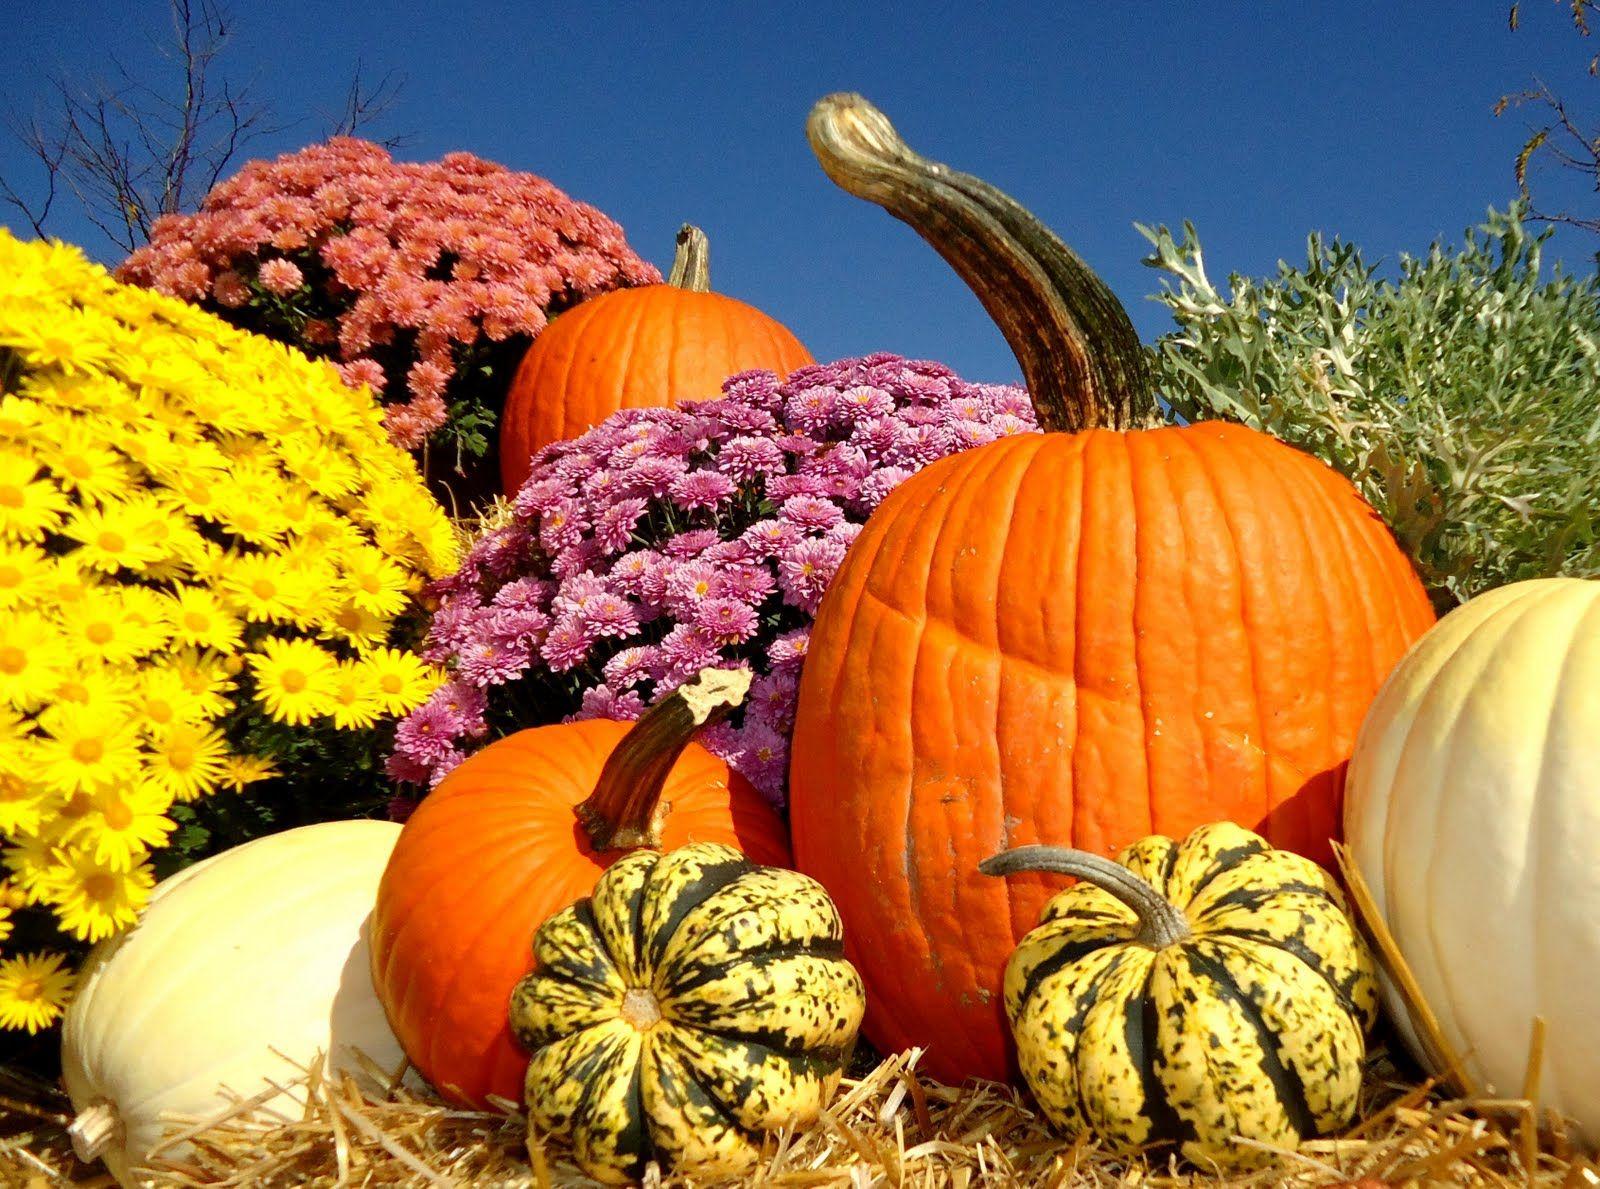 fall scenes with pumpkins bing images - Fall Pumpkins